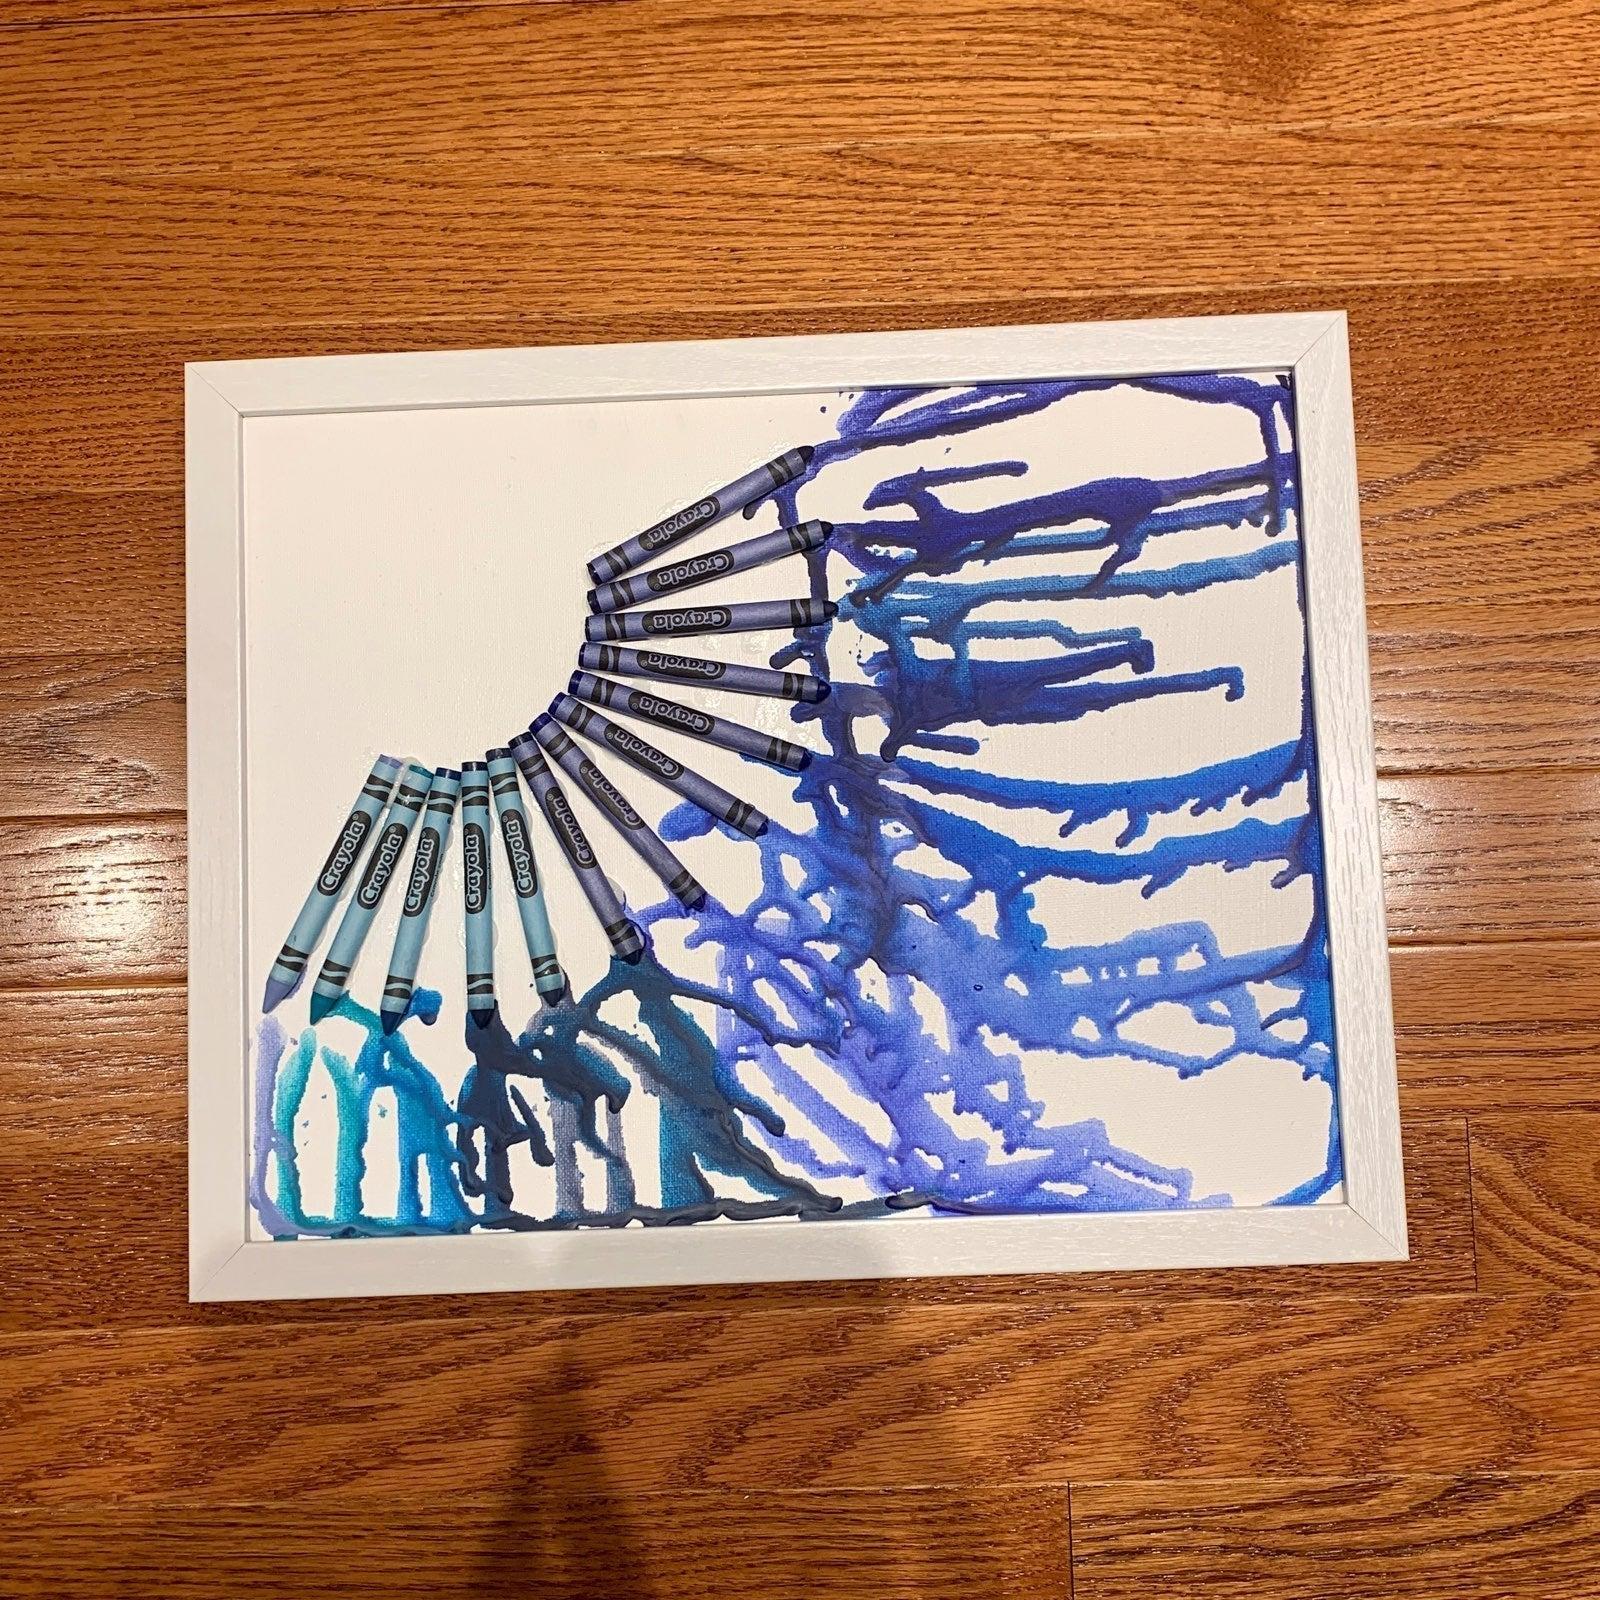 Unframed 11x14 Melted Crayola Art